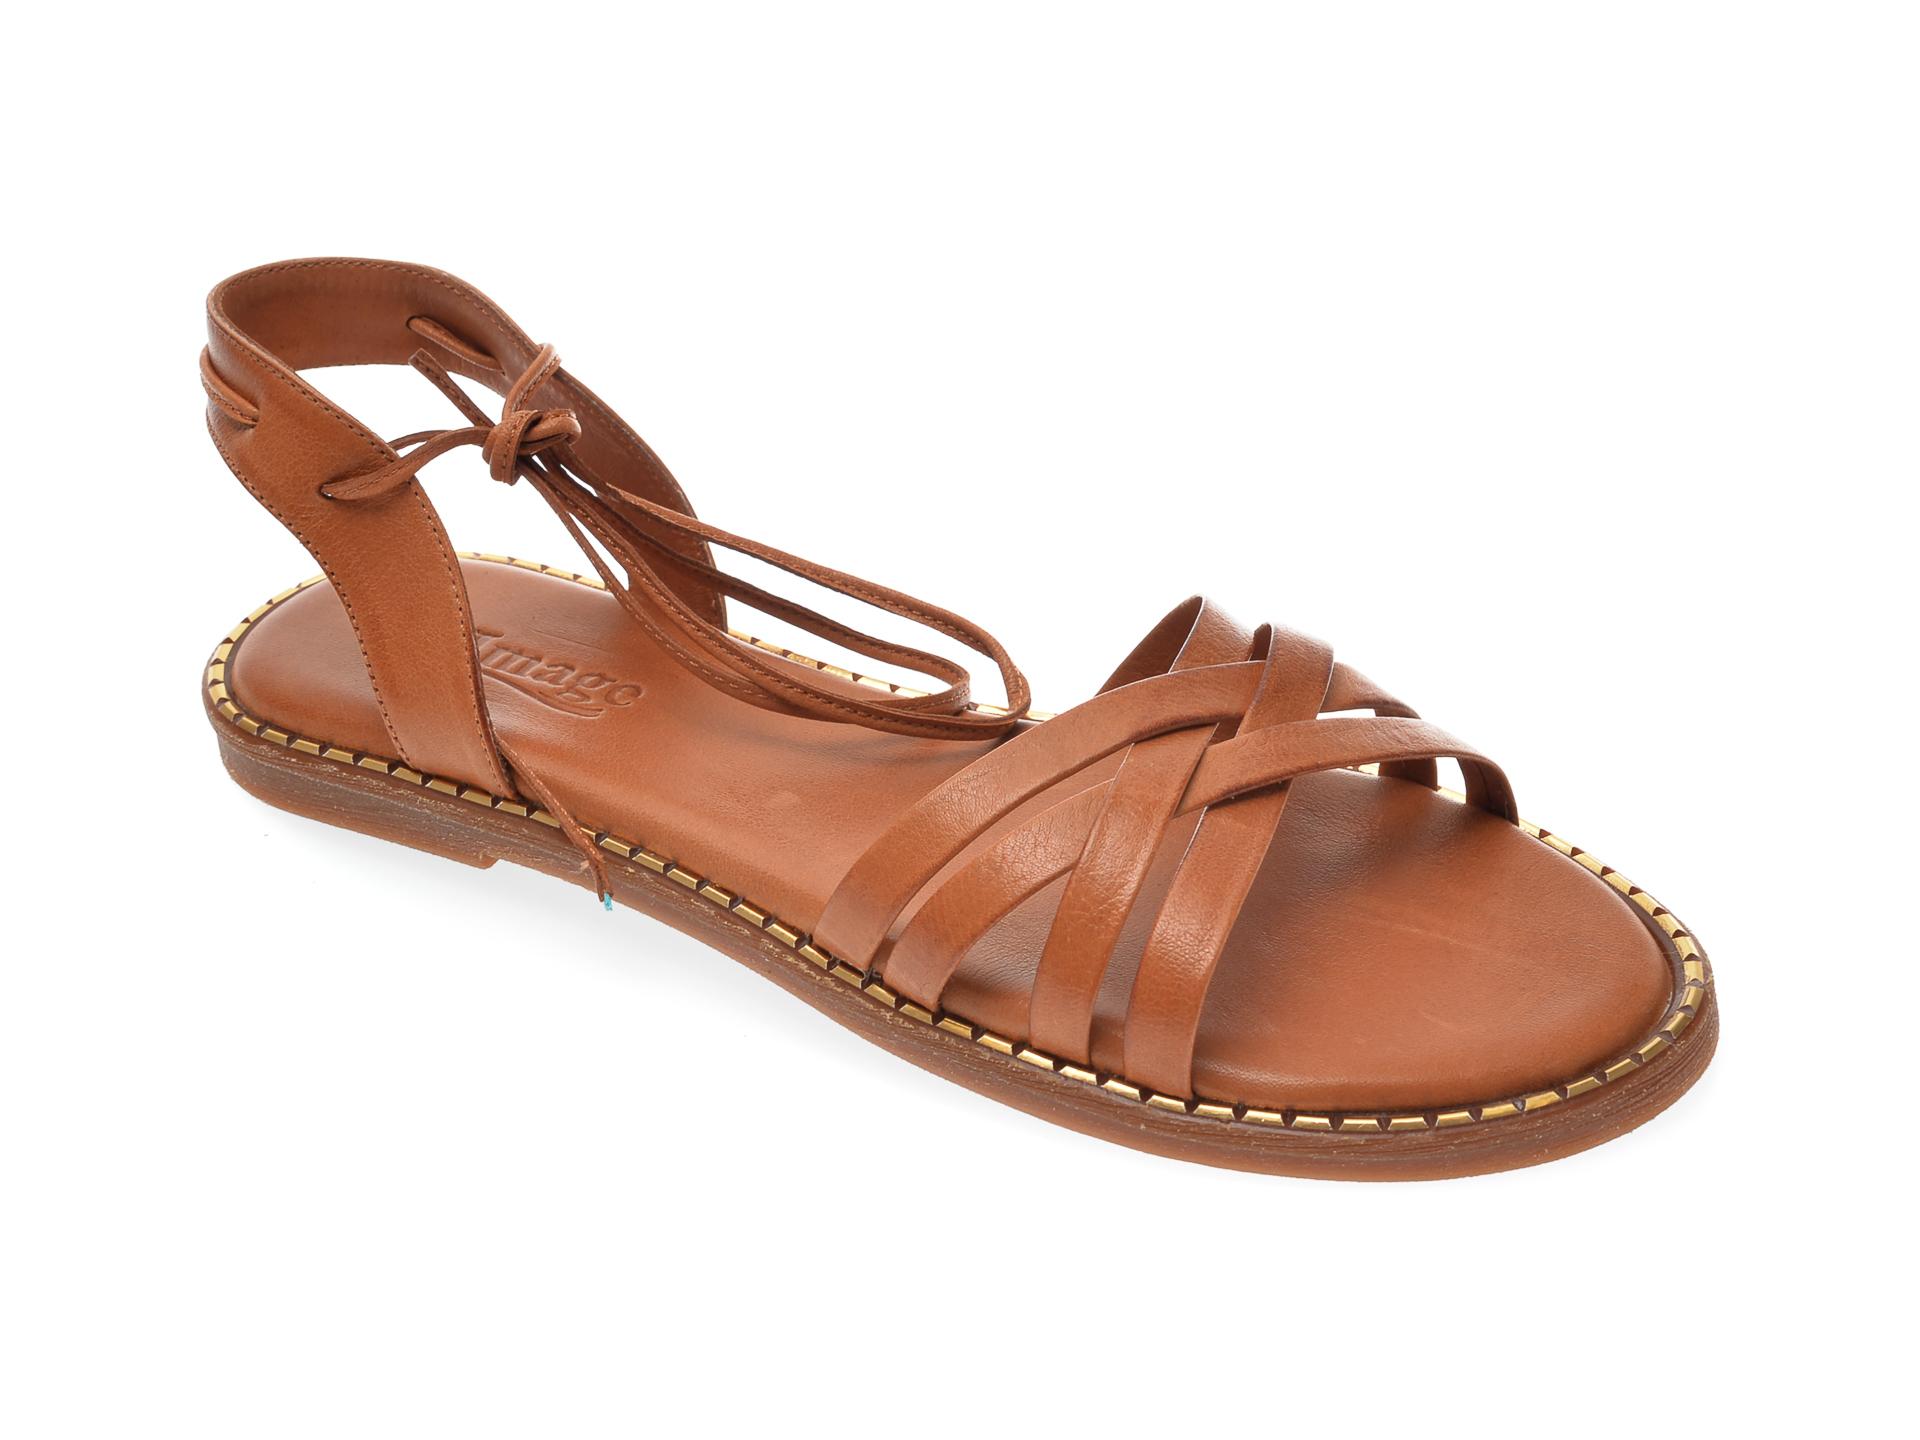 Sandale IMAGE maro, 717, din piele naturala imagine otter.ro 2021